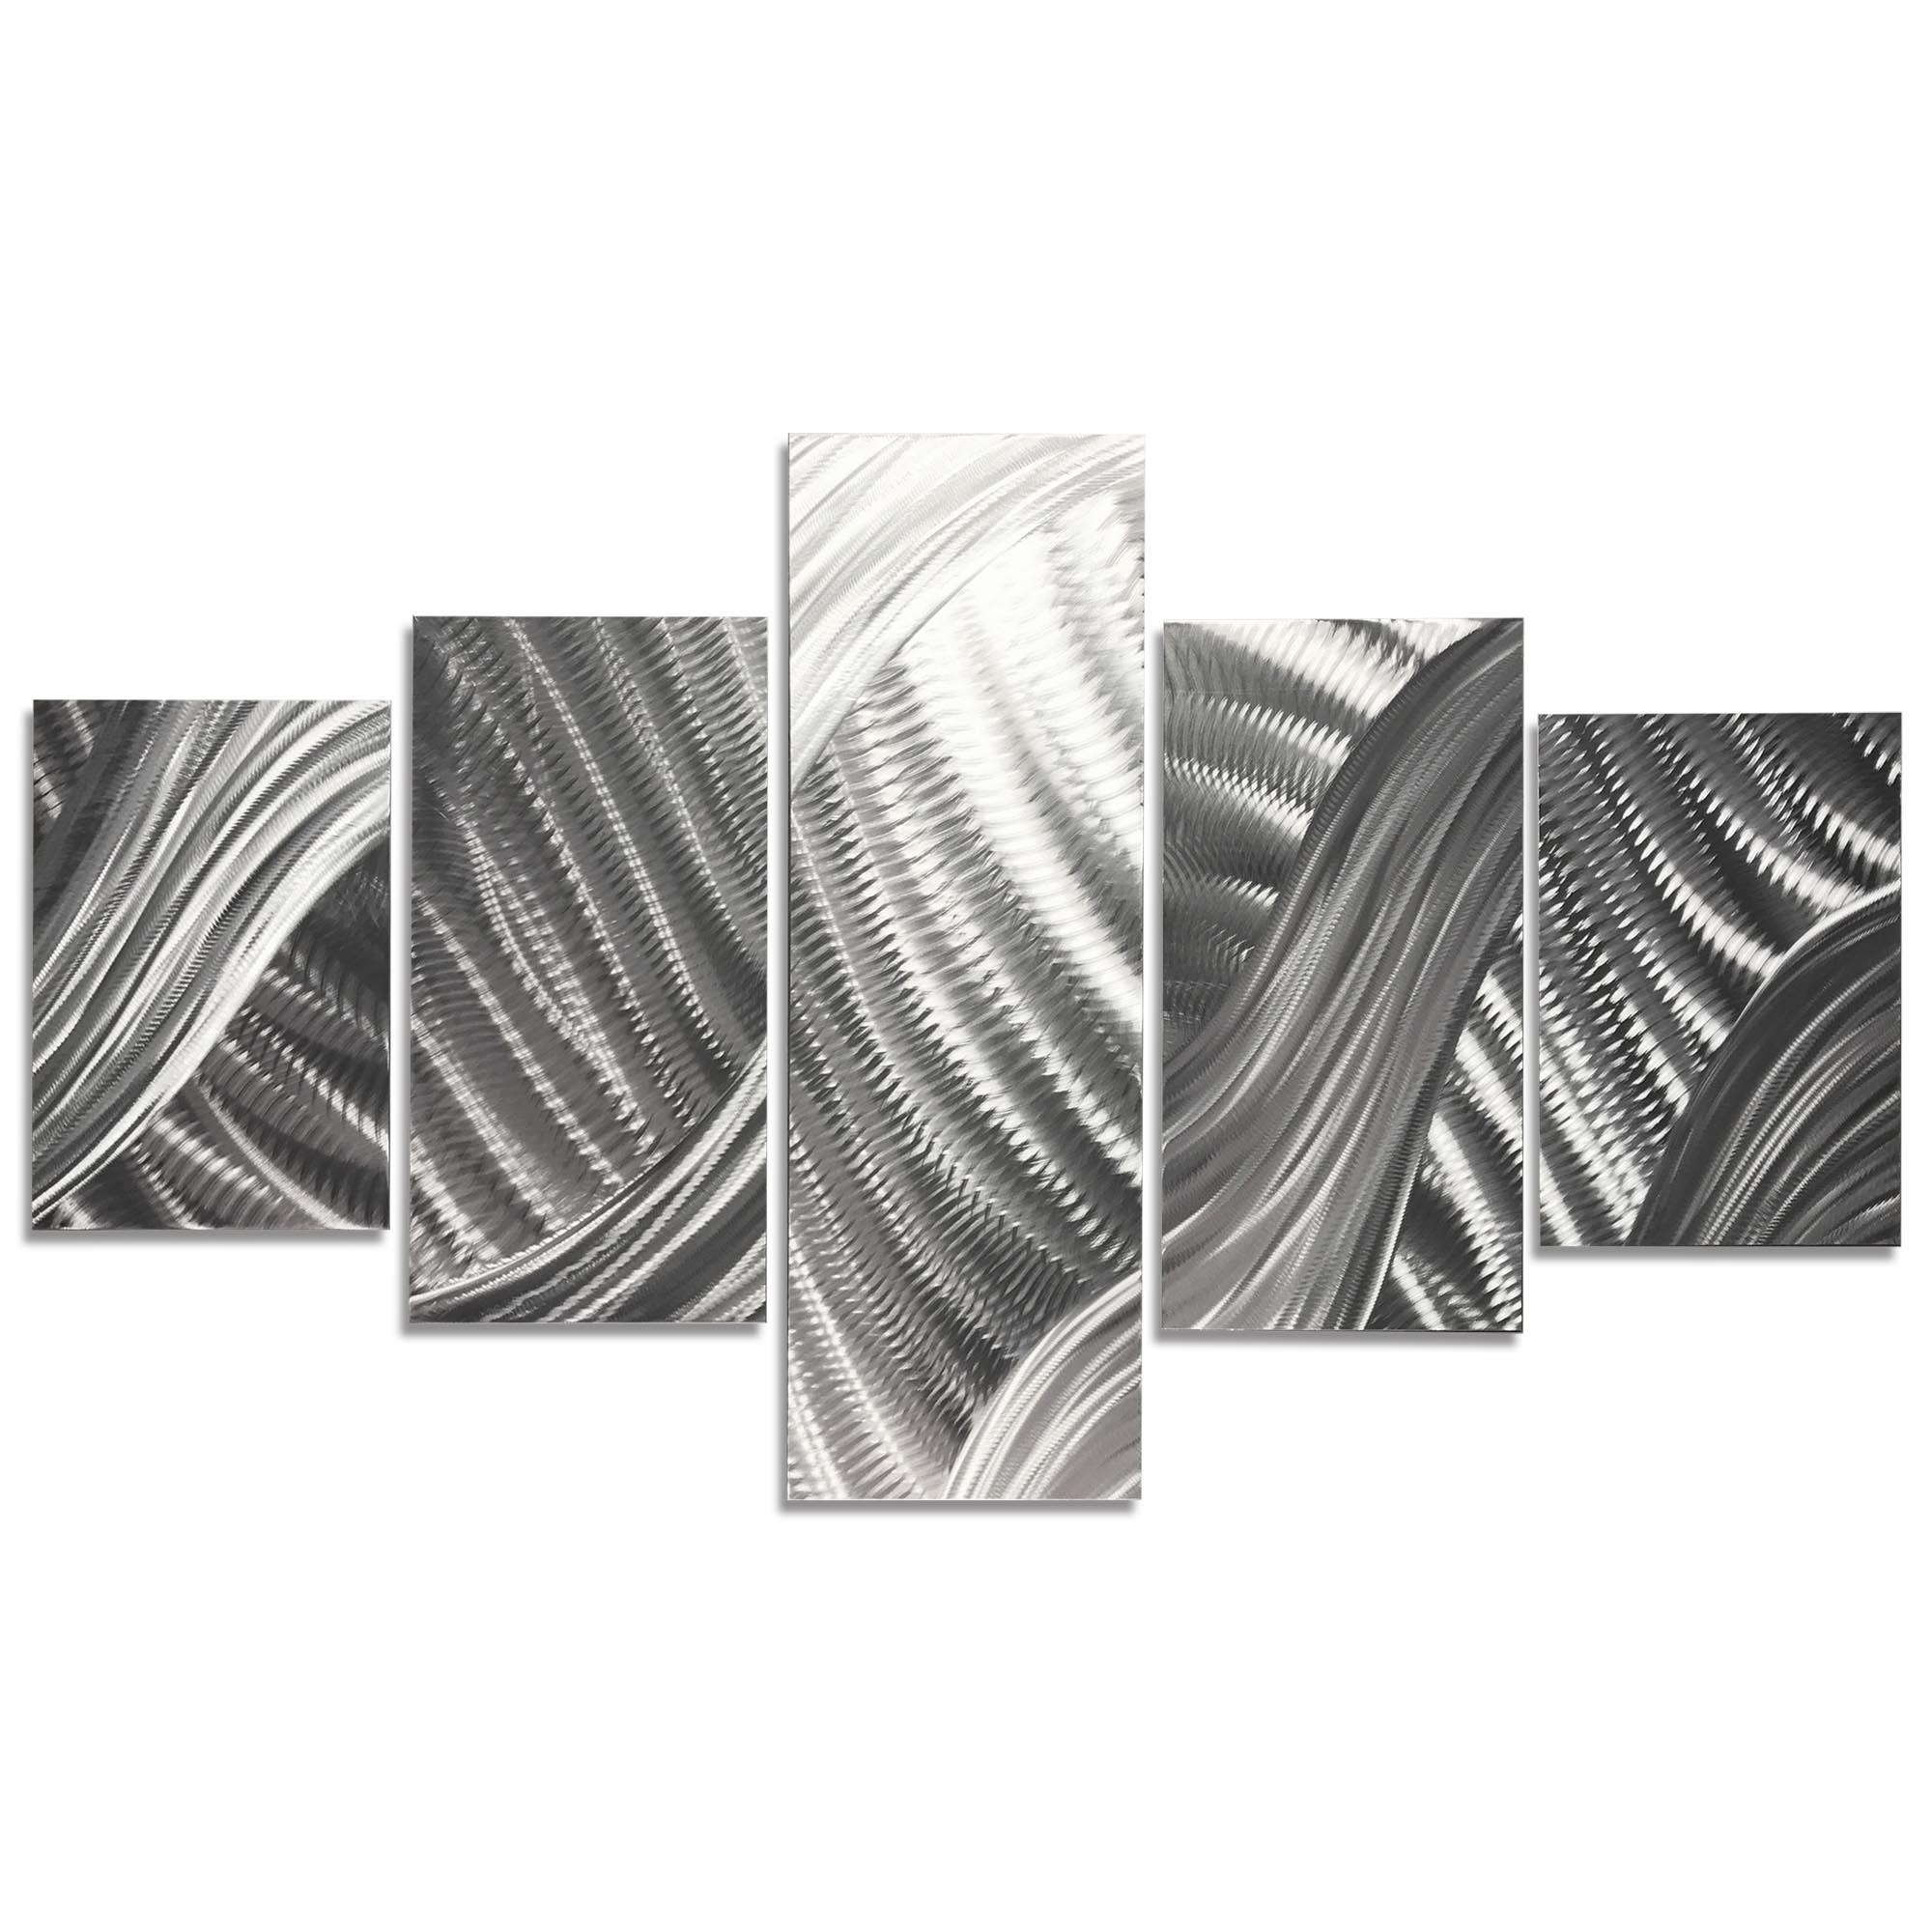 Columnar Brushstrokes 64x36in. Natural Aluminum Abstract Decor